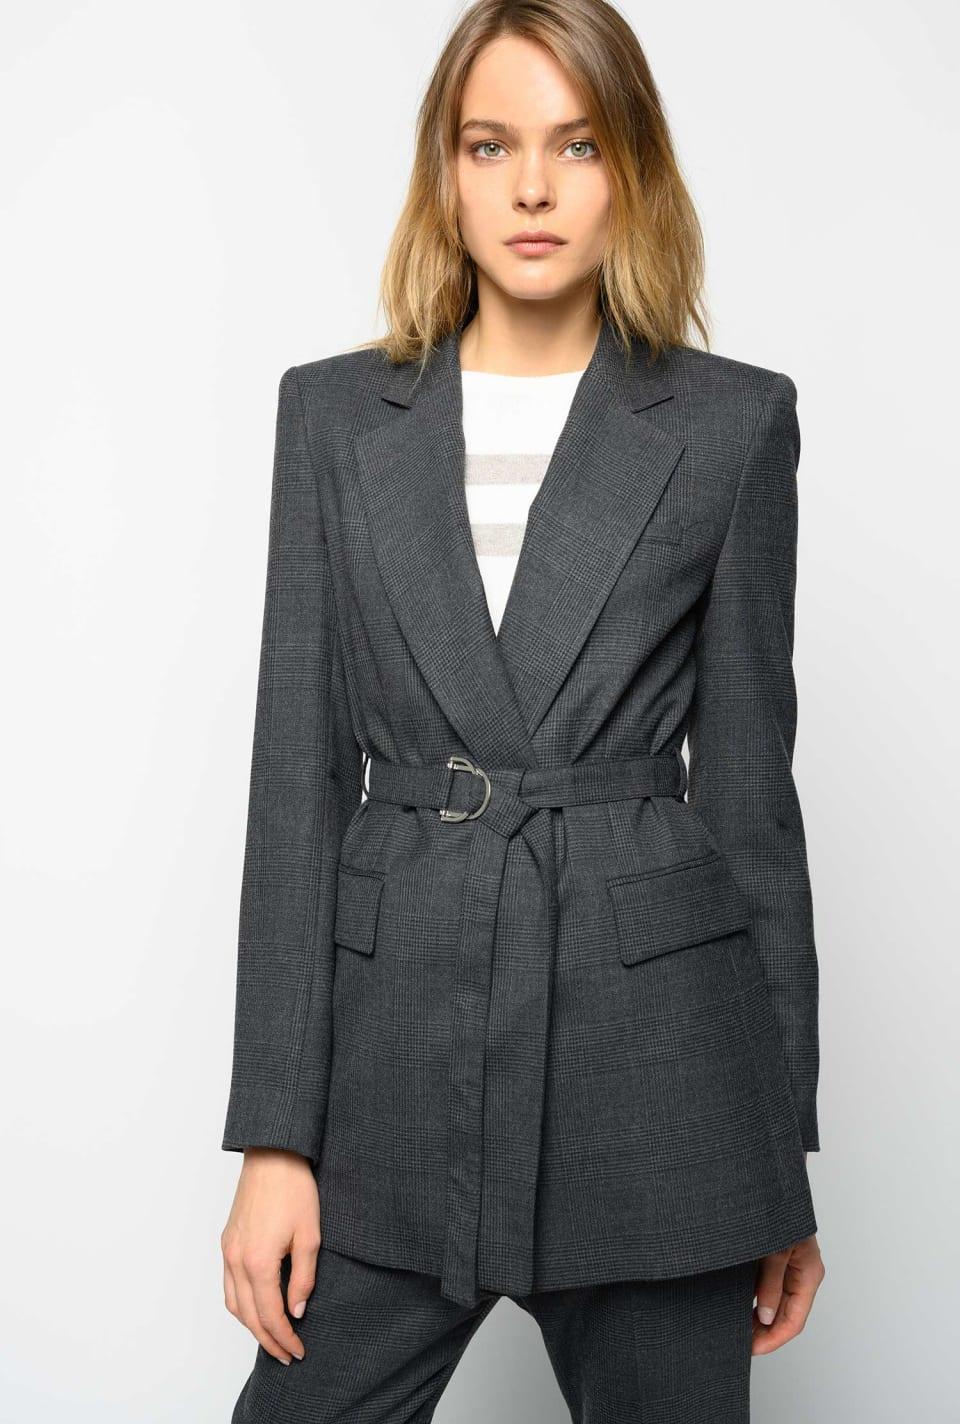 Blazer in galles di lana